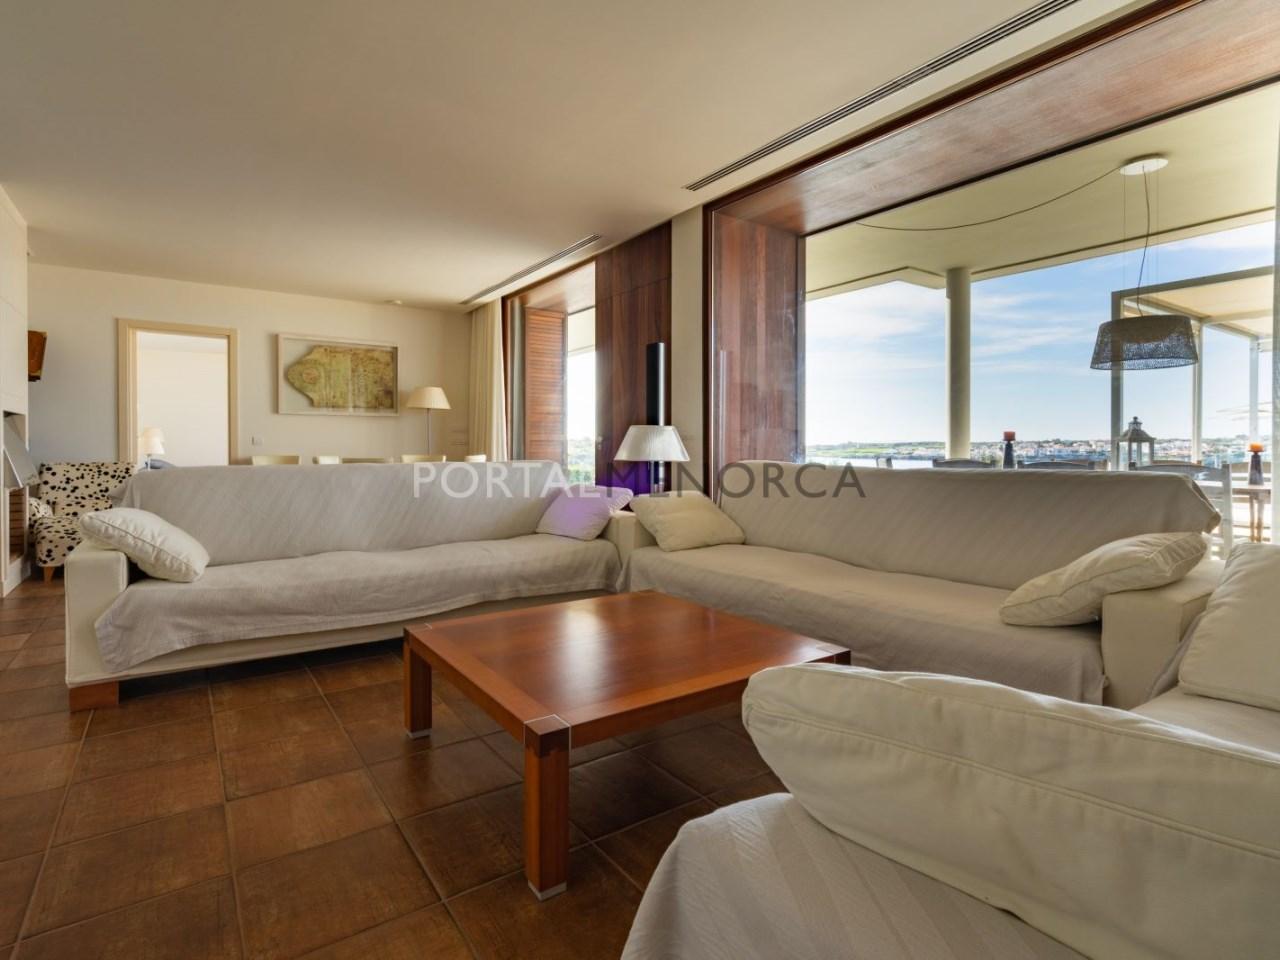 luxe-maison-vendre-acheter-menorca (2)